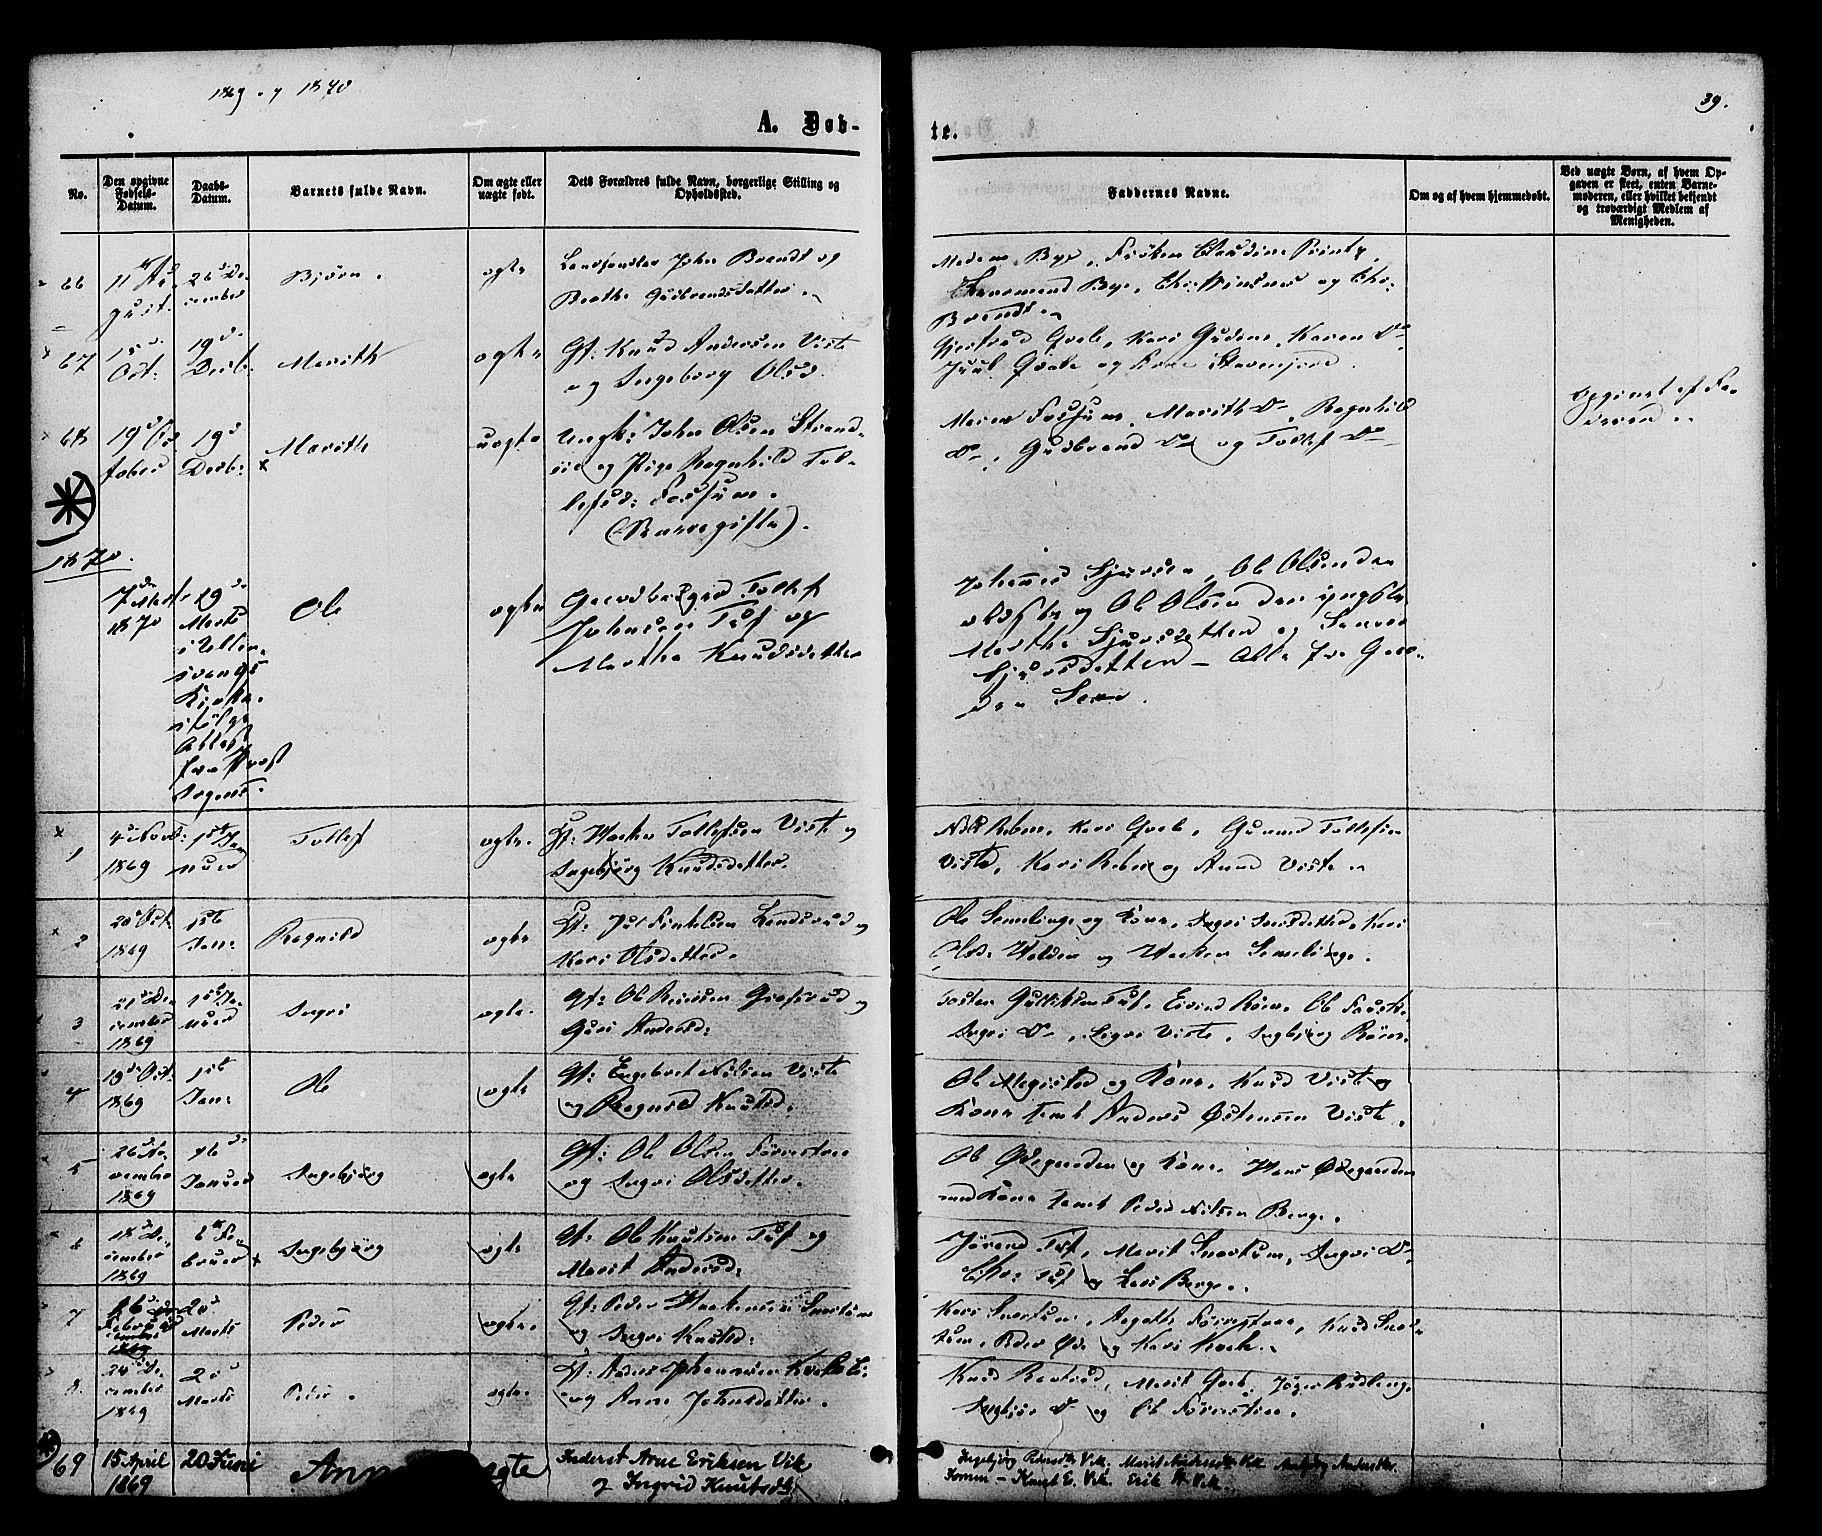 SAH, Vestre Slidre prestekontor, Ministerialbok nr. 3, 1865-1880, s. 39